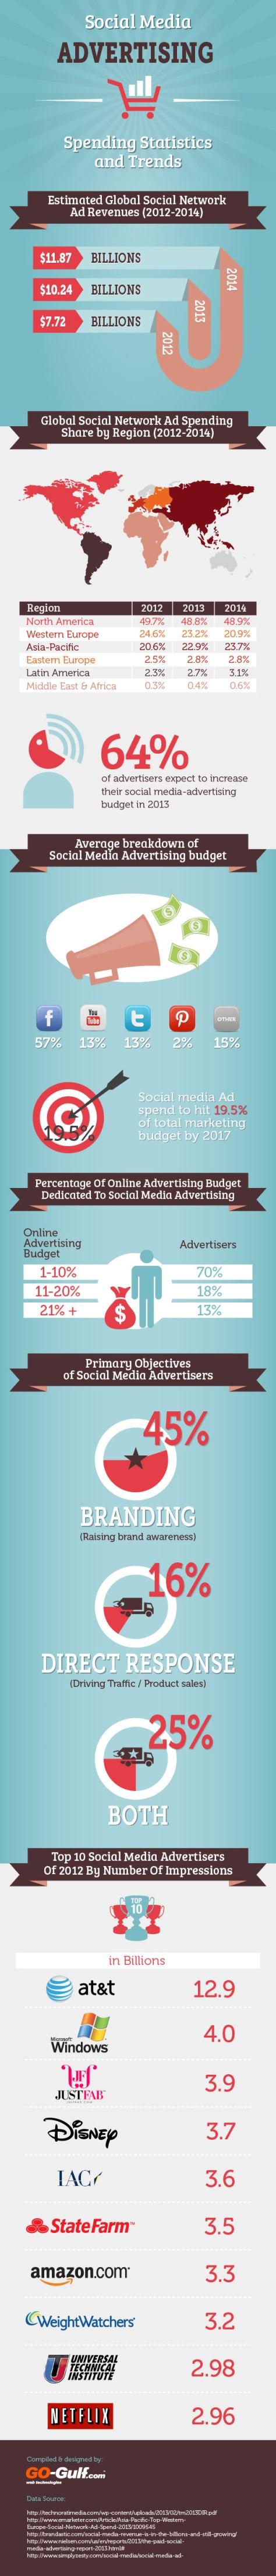 Social Media Advertising Spending Statistics And Trends